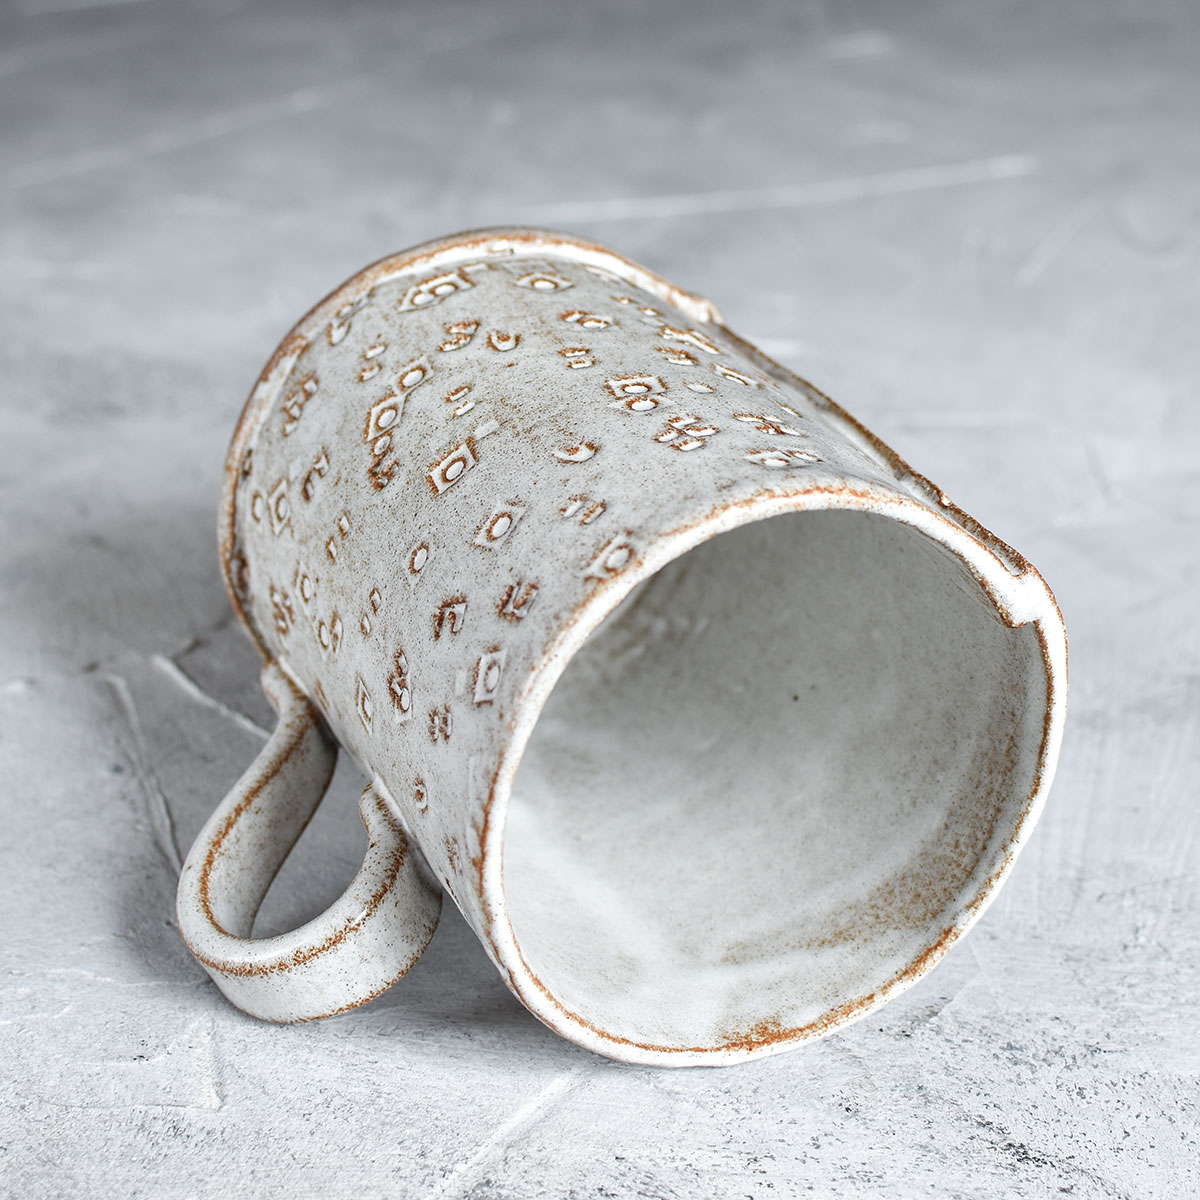 картинка Кружка из пласта с рельефом 1 - DishWishes.Ru